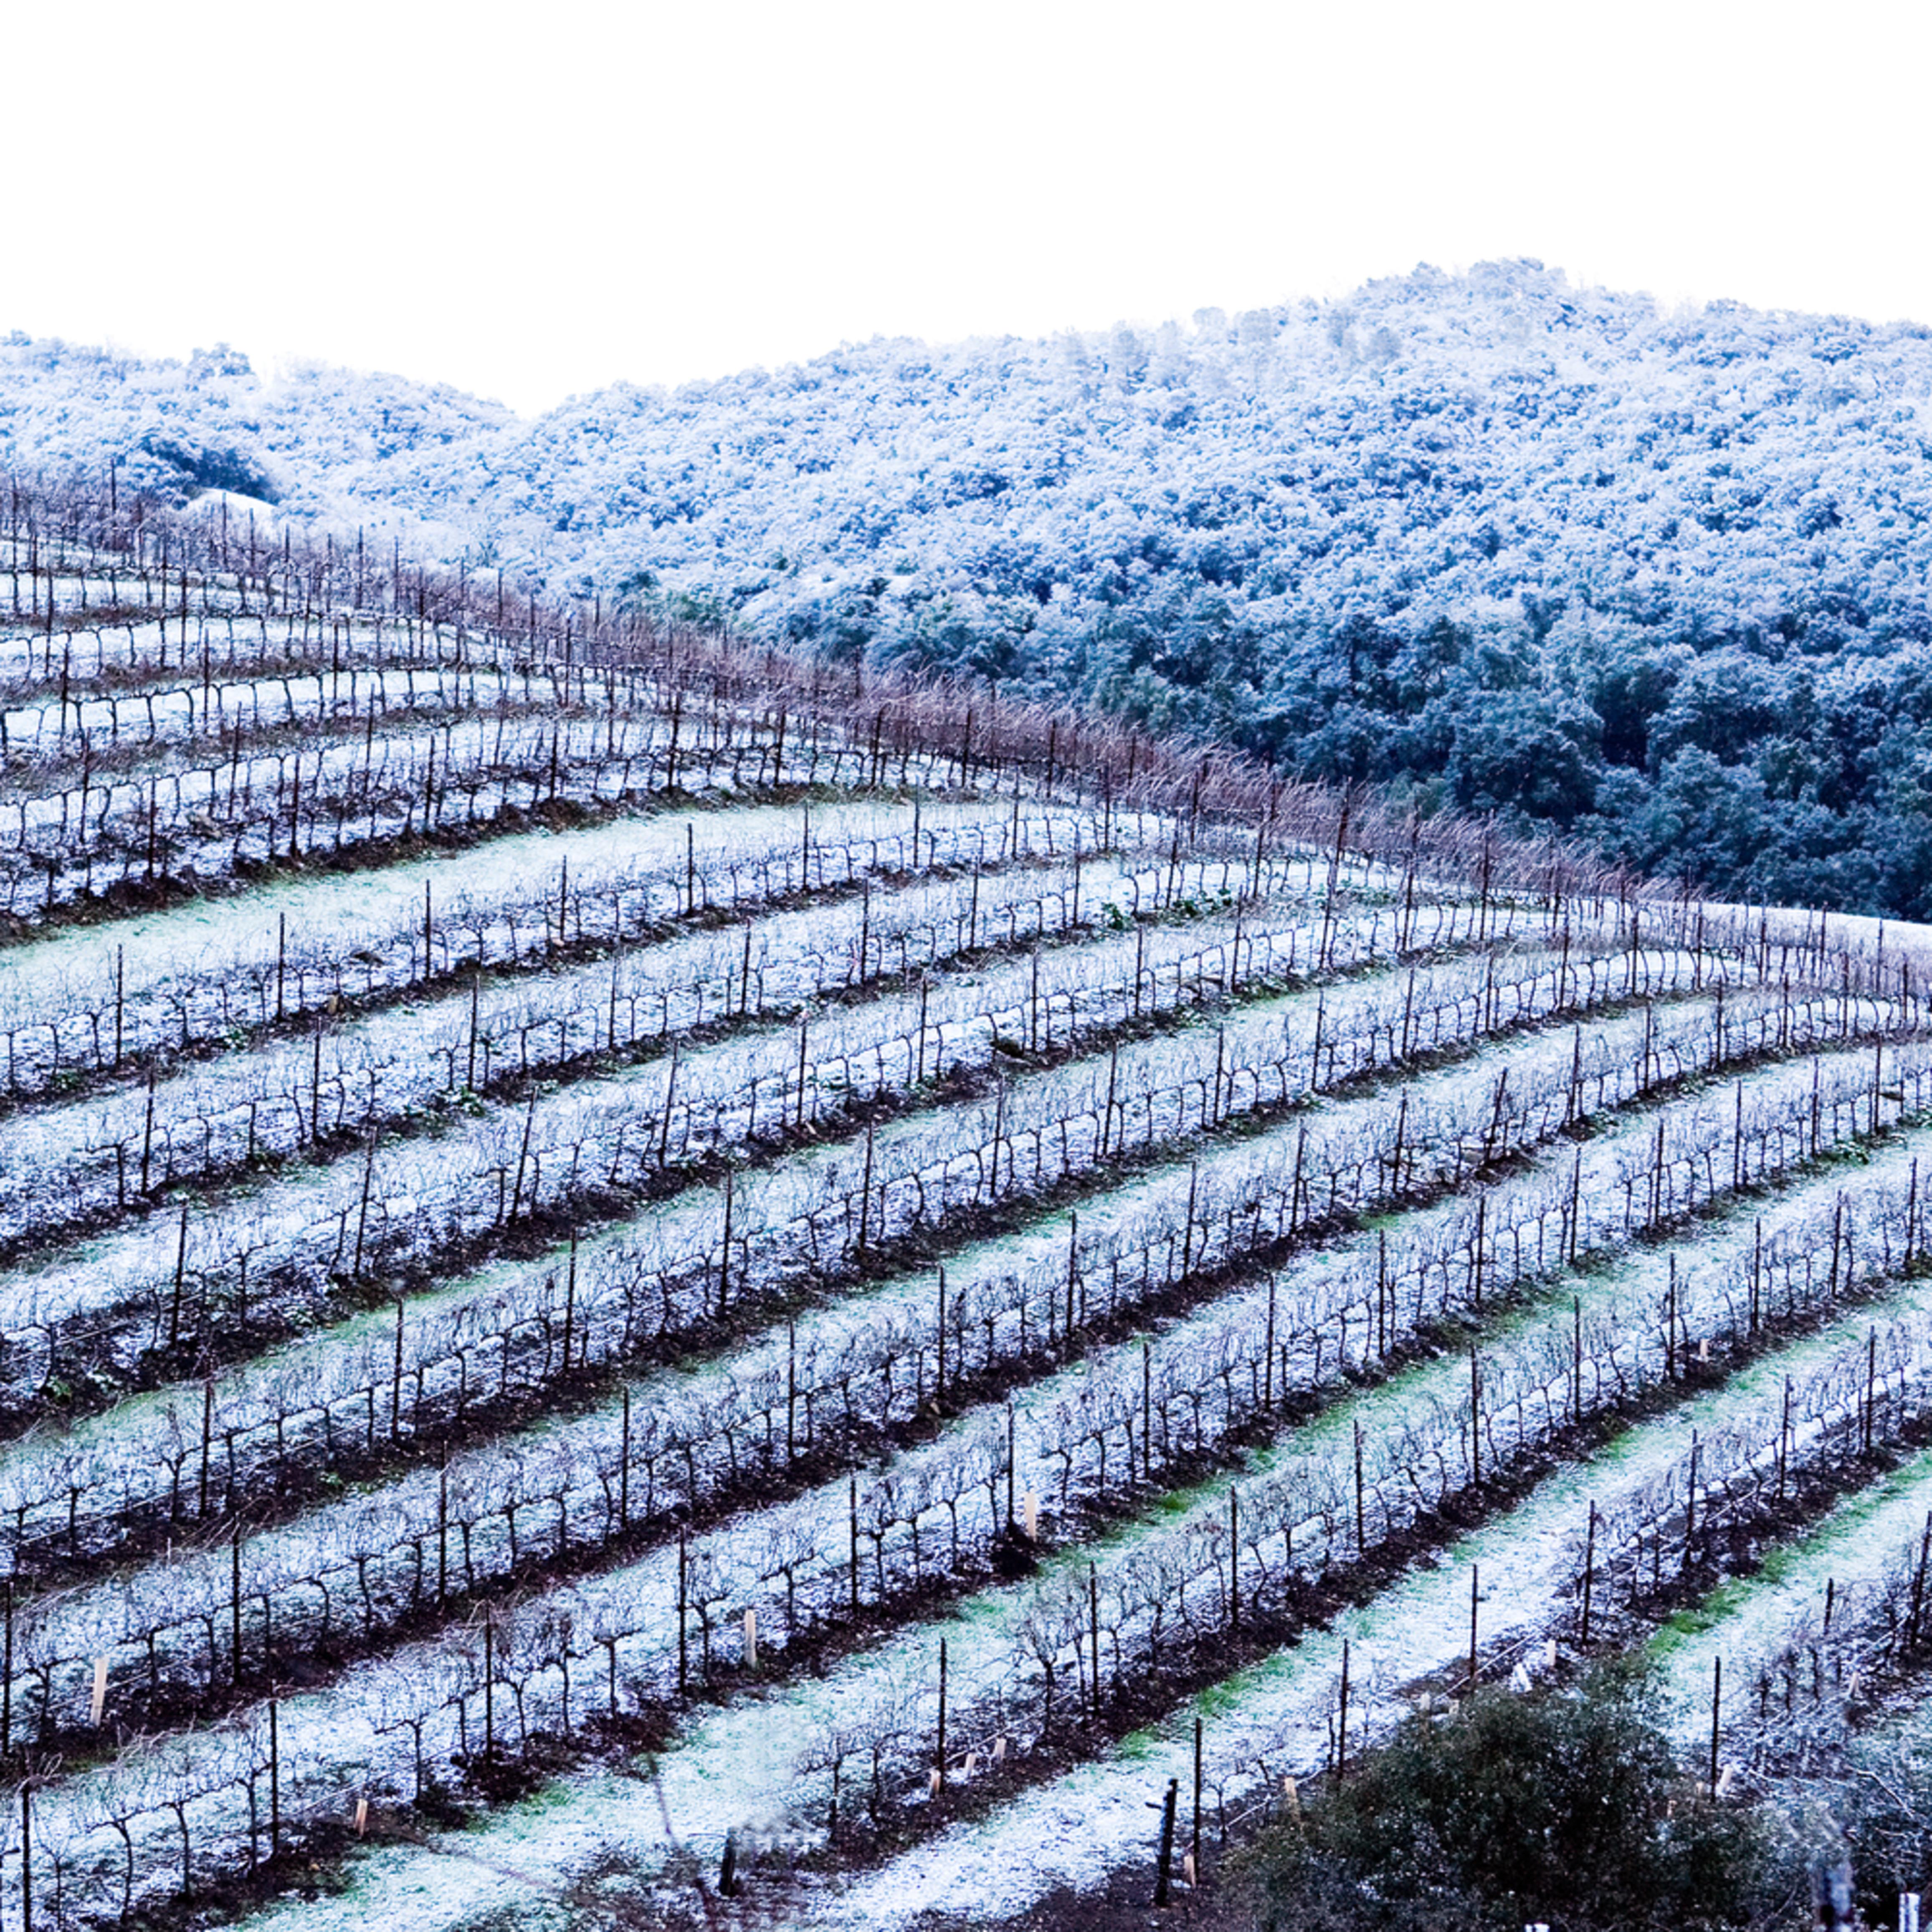 Snowy vineyard g3banl